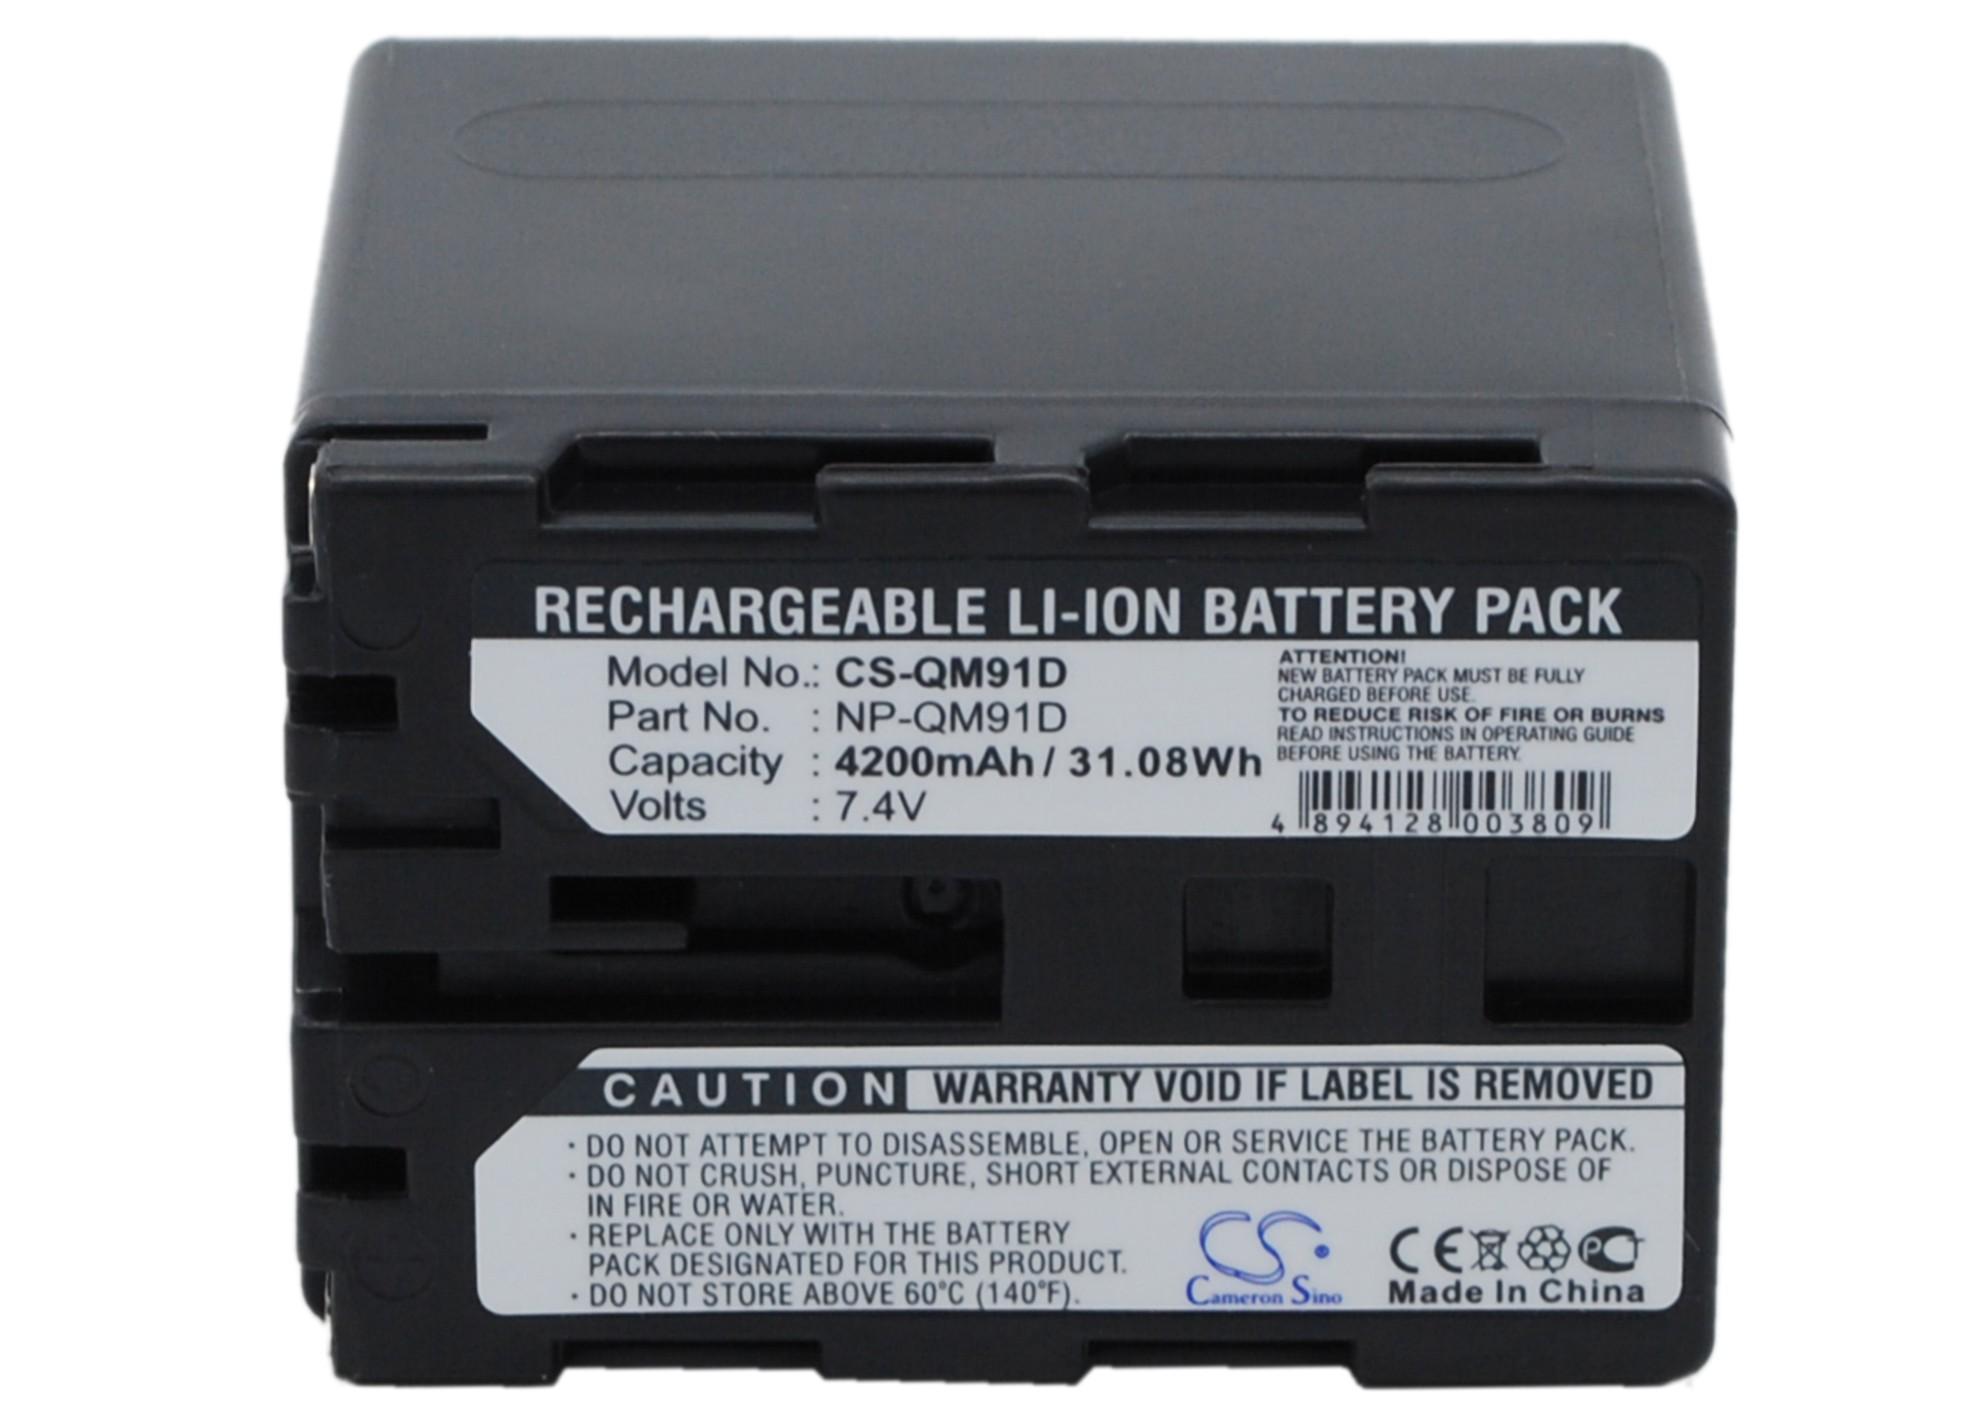 Cameron Sino baterie do kamer a fotoaparátů pro SONY DCR-TRV265E 7.4V Li-ion 4200mAh tmavě šedá - neoriginální